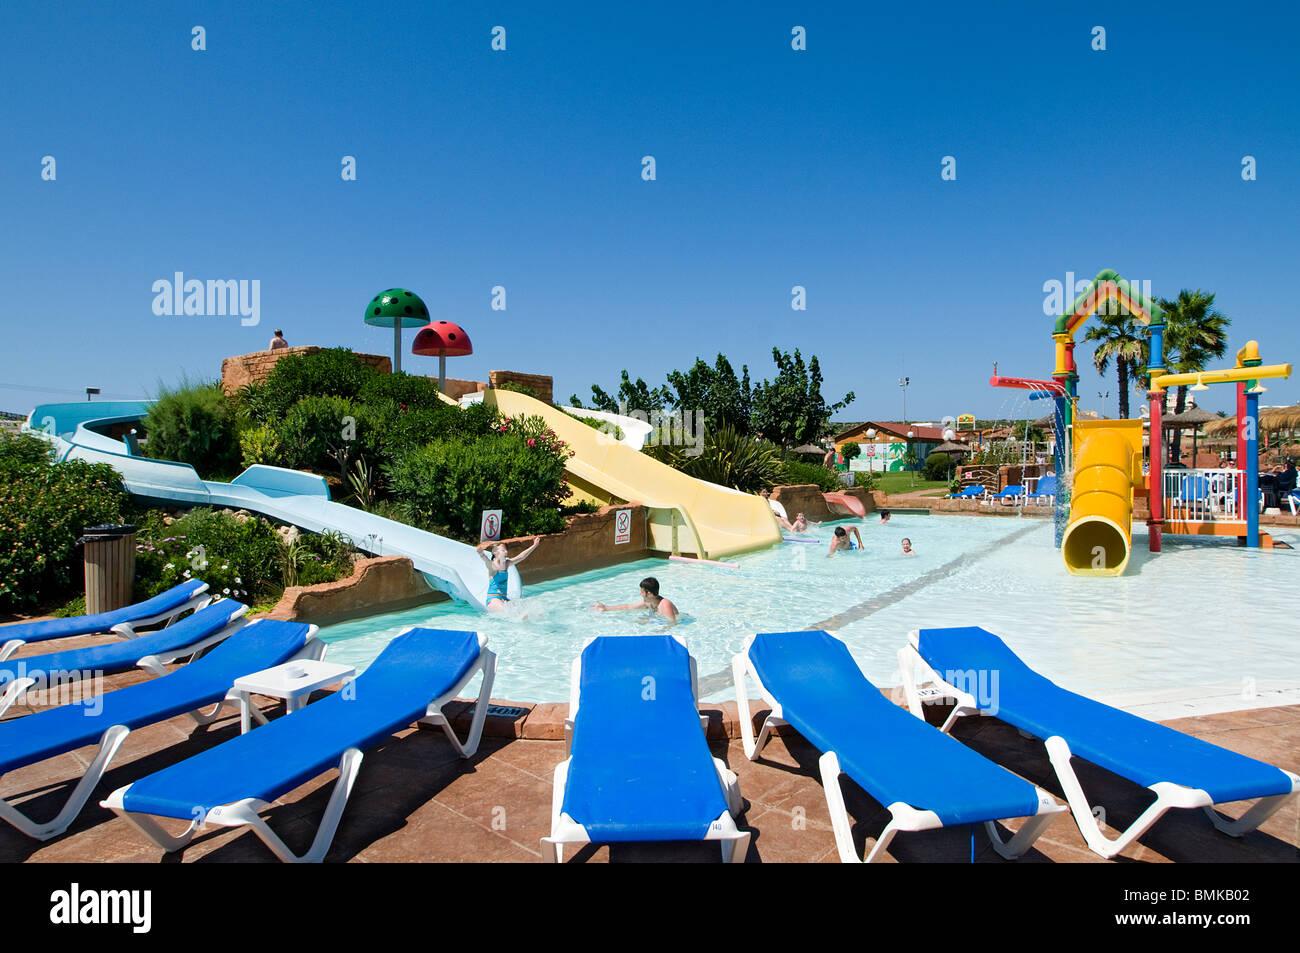 Parque Acuático Splashtastic Calan Forcat Menorca España Foto